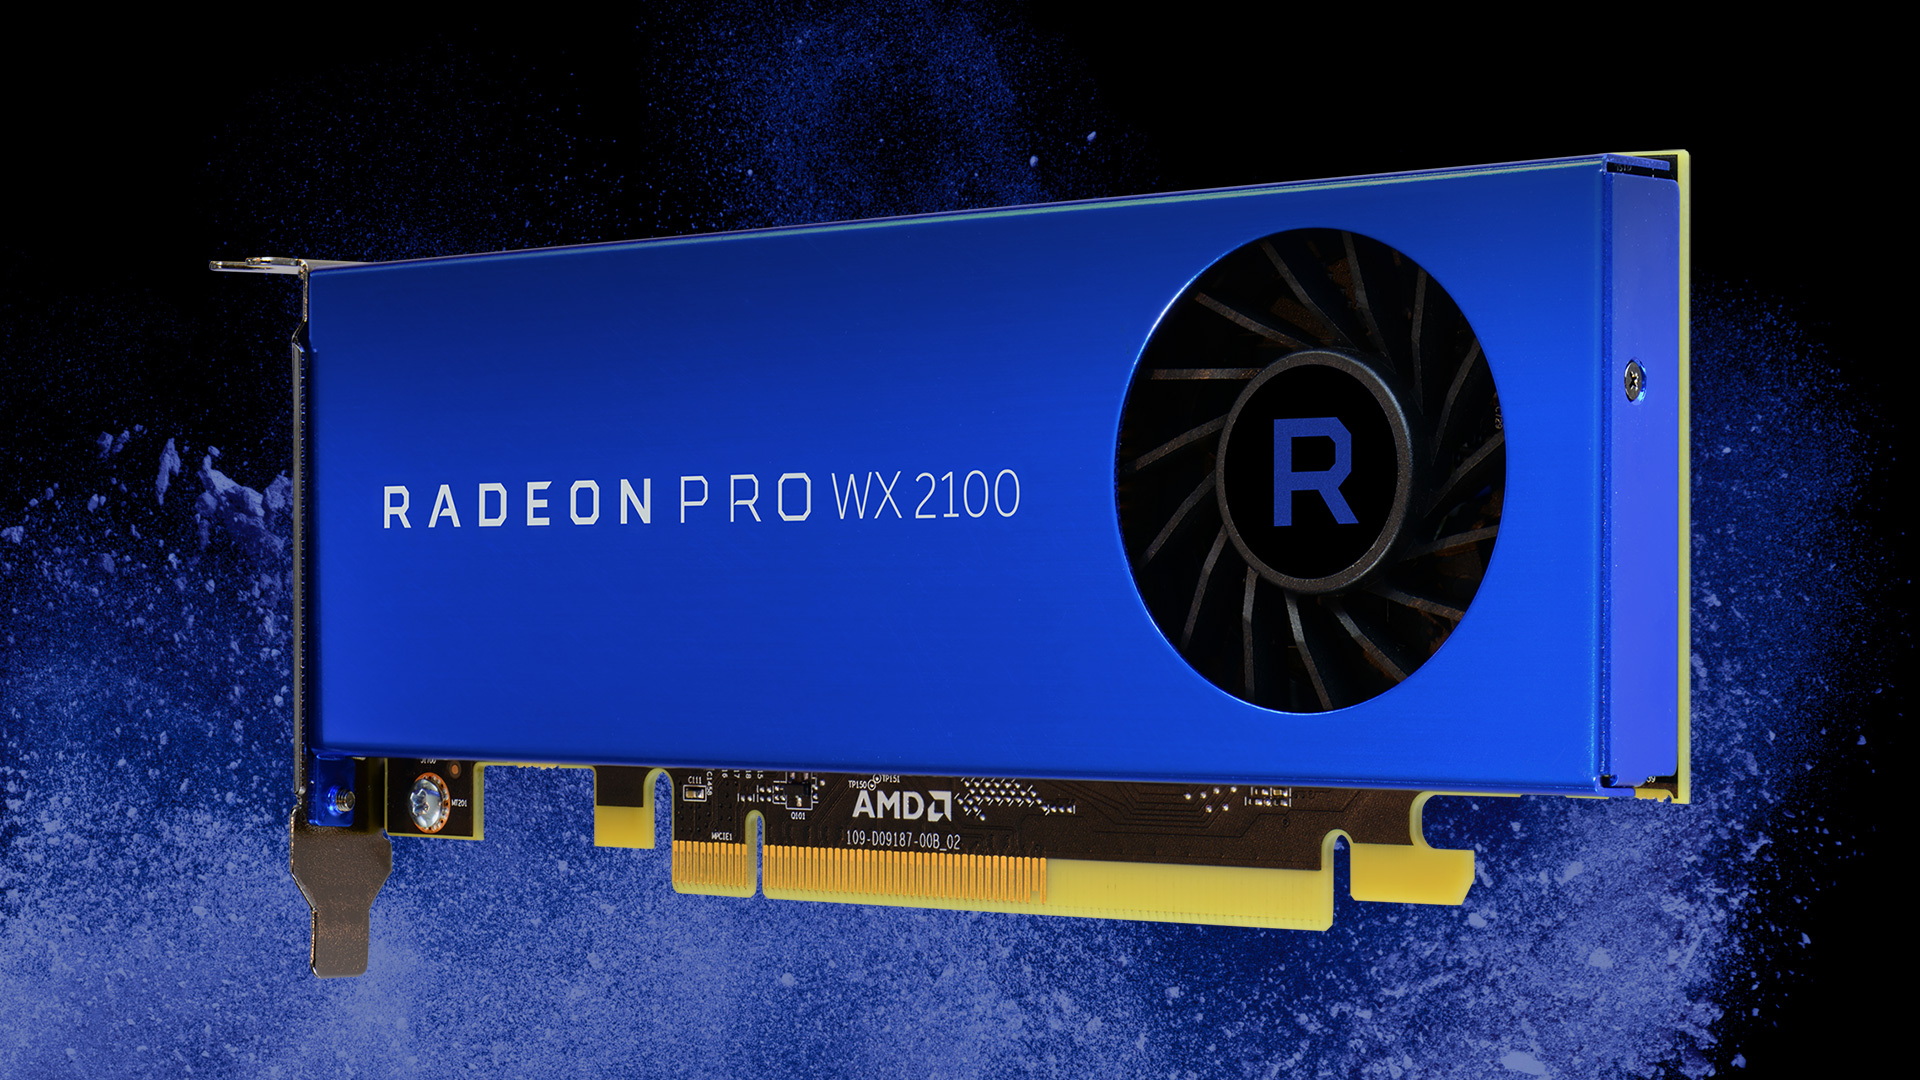 amd radeon pro wx 200 workstation graphics card